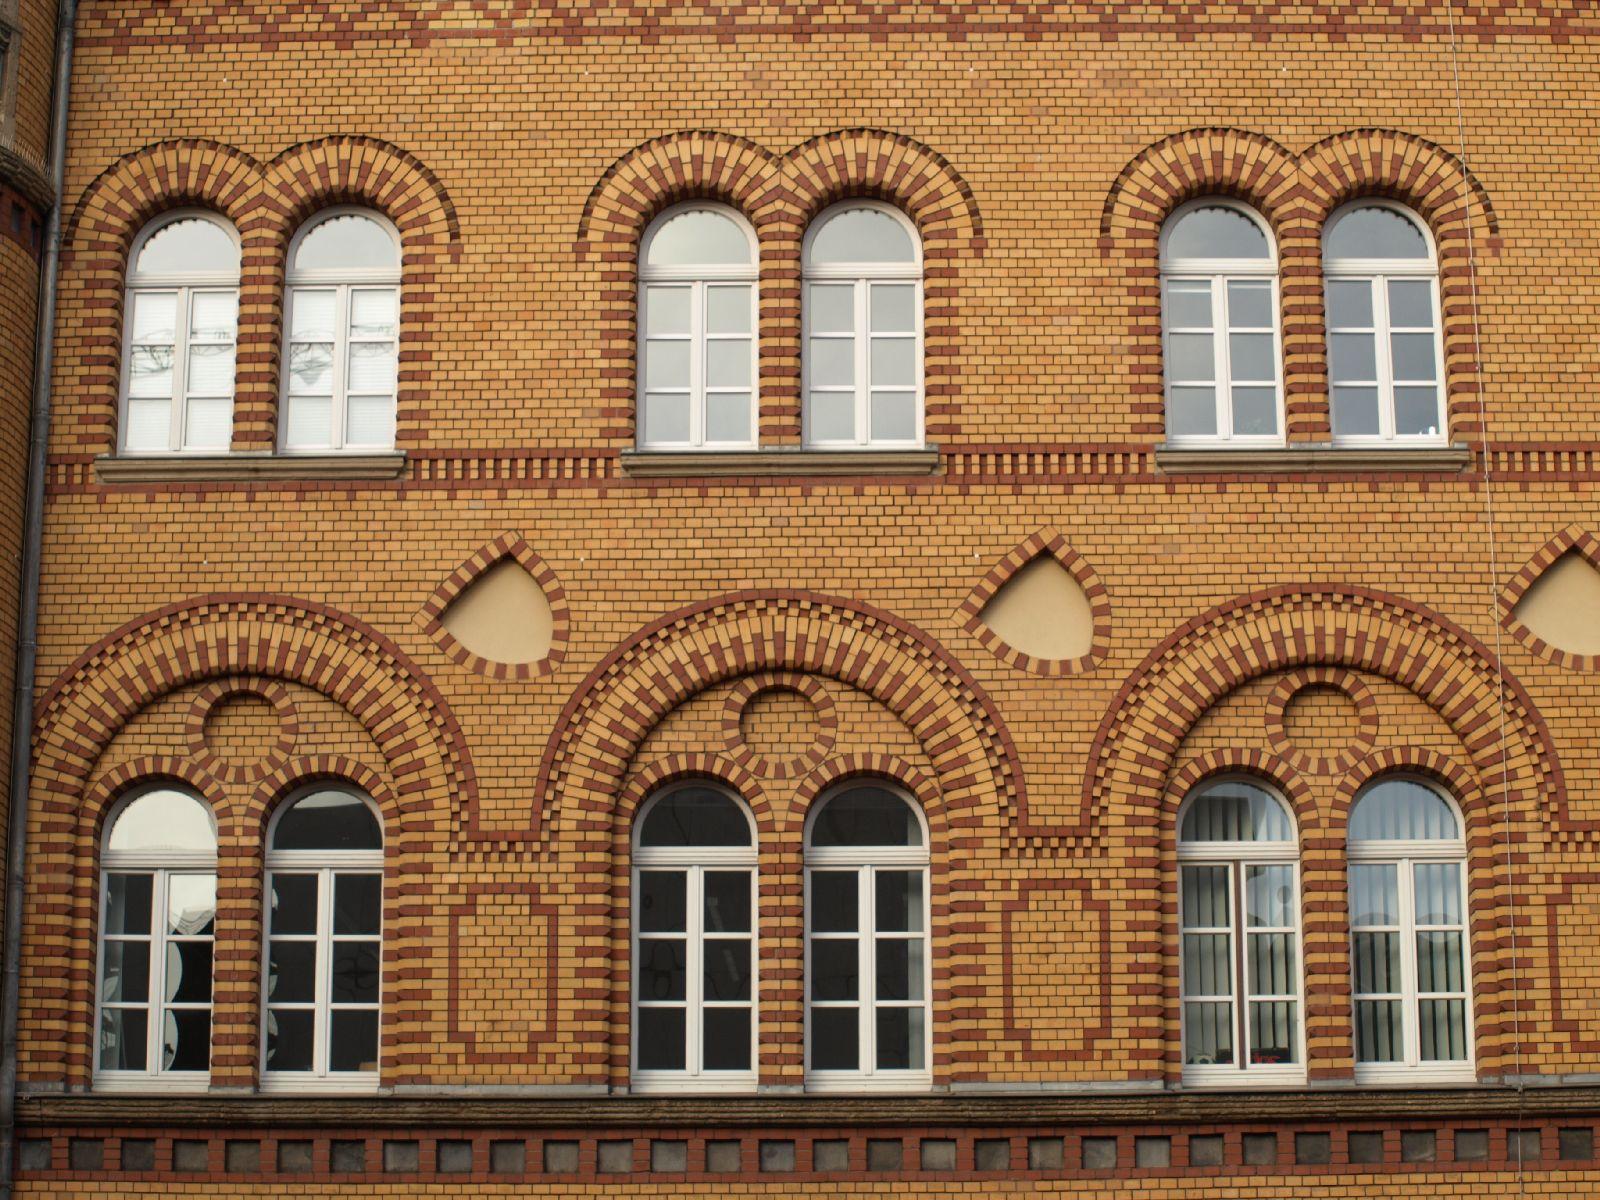 Gebaeude-Architektur_Textur_A_PB010838